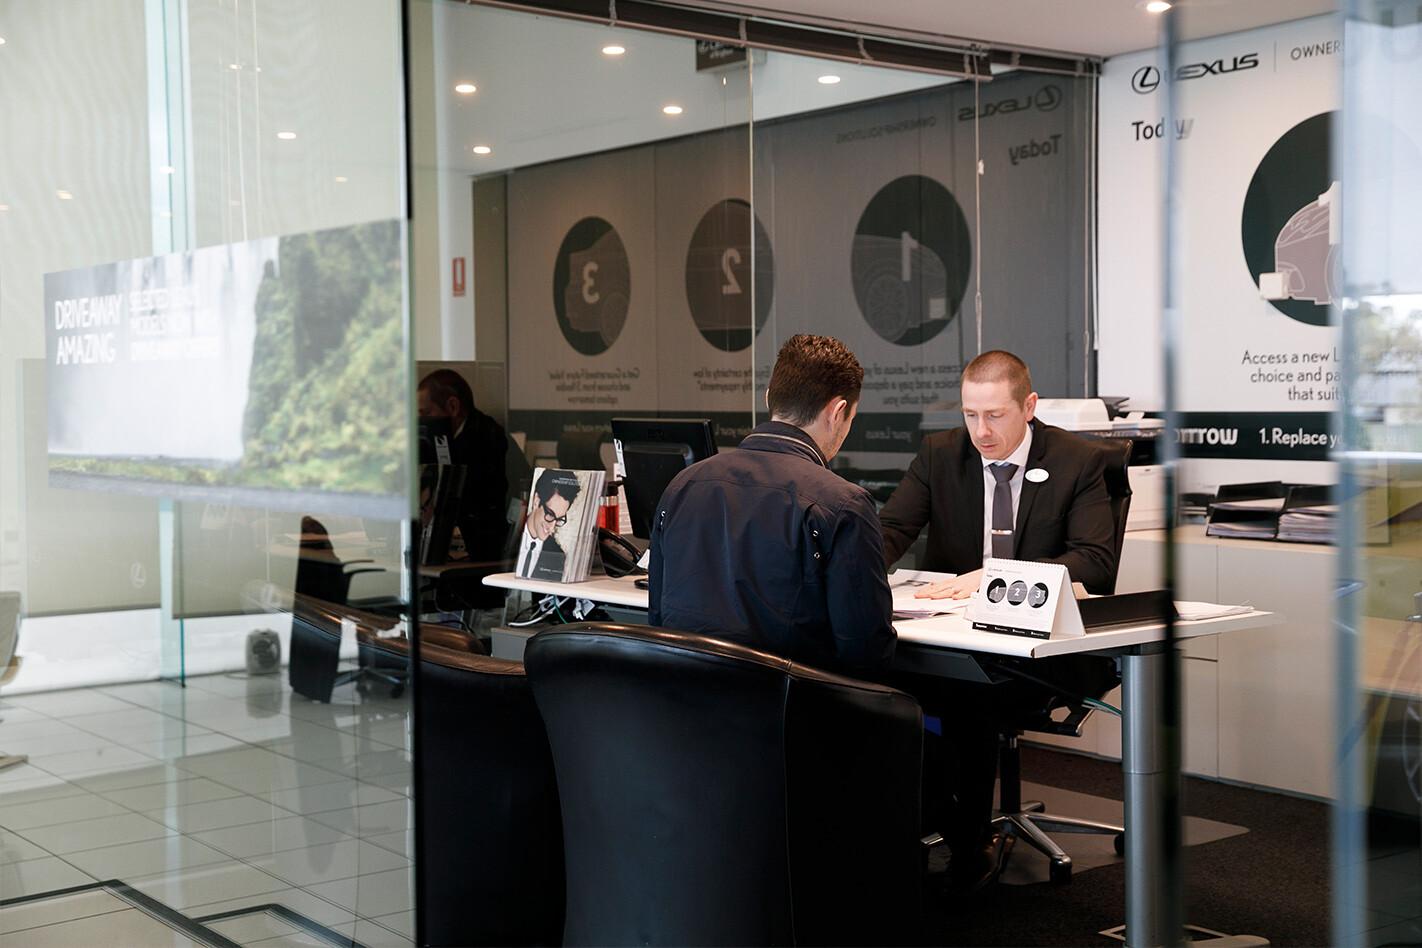 Lexus Jdpower Dealership Jpg